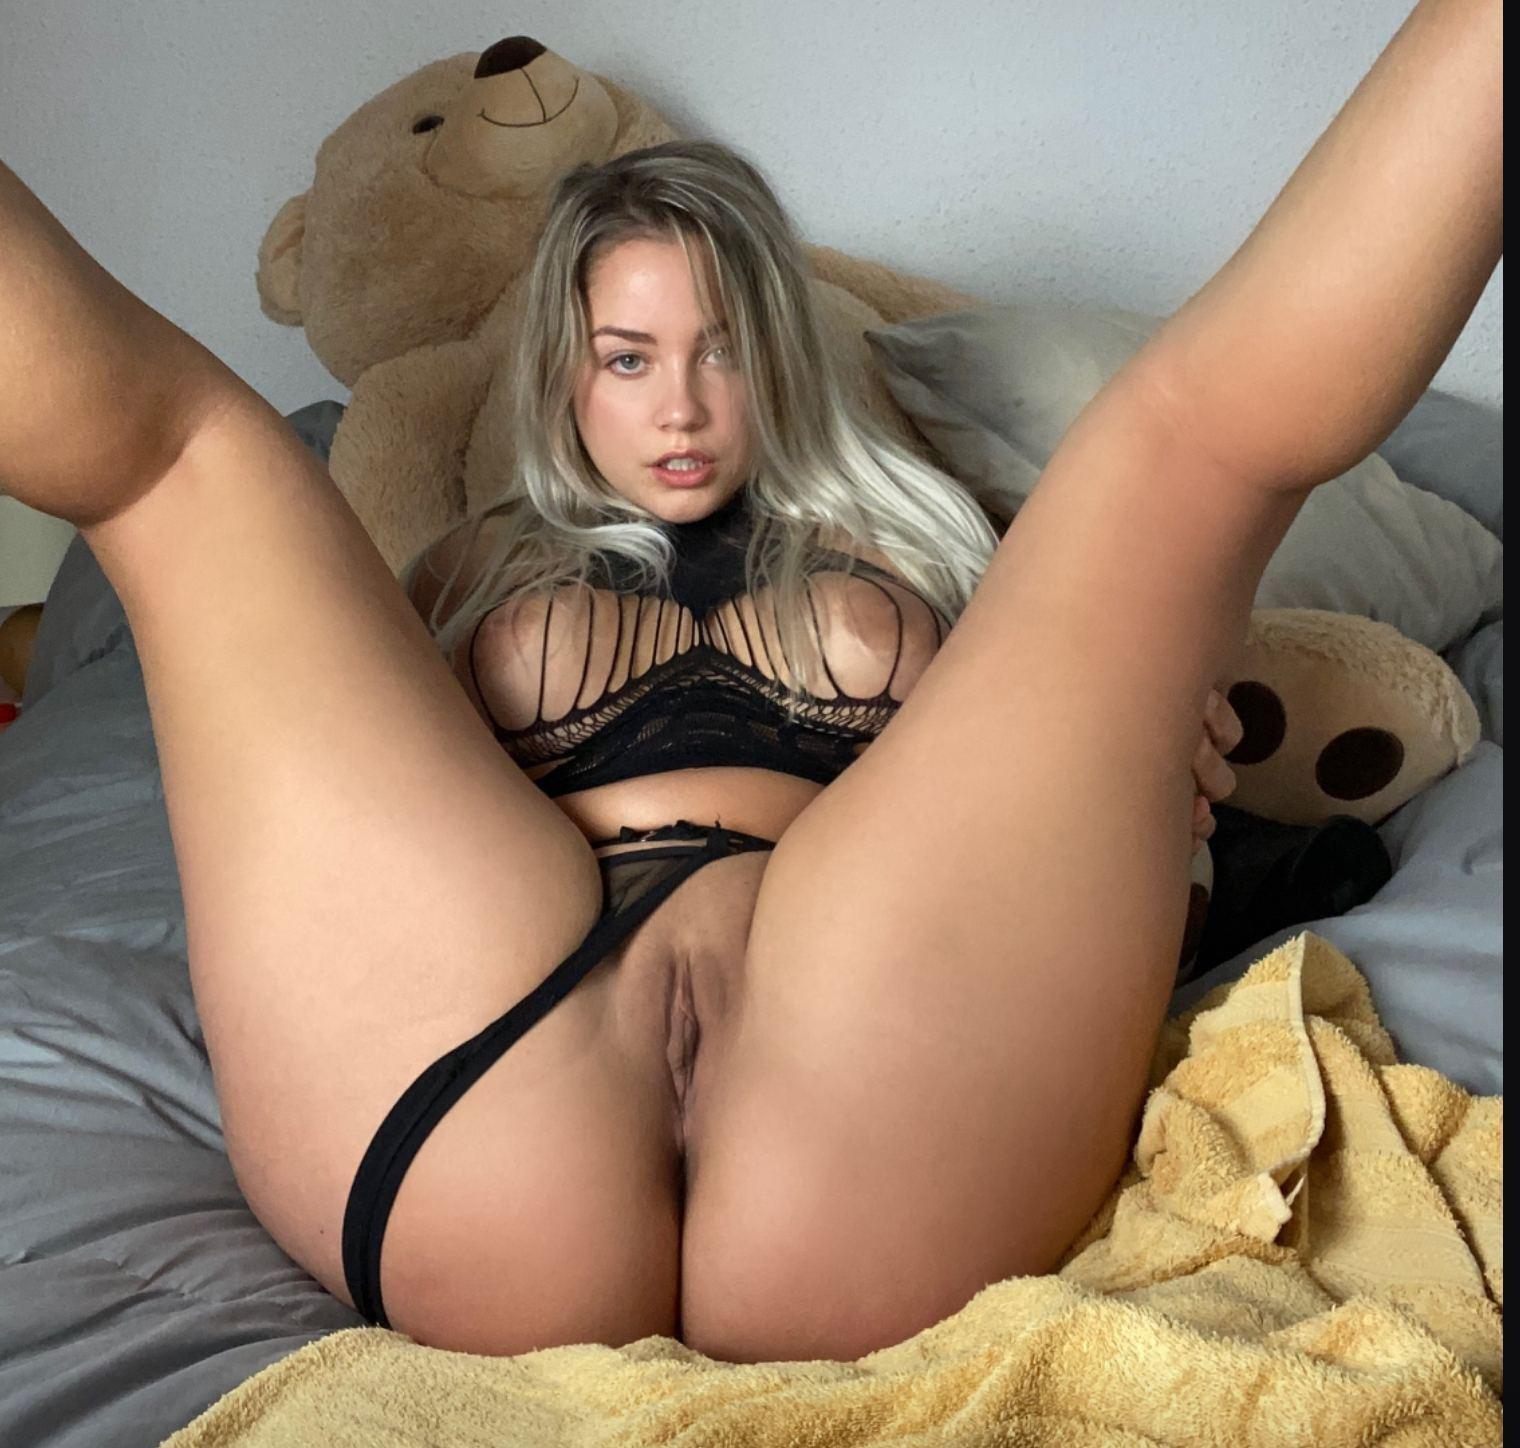 Paola CelebTv onlyfans fotos calientes 2